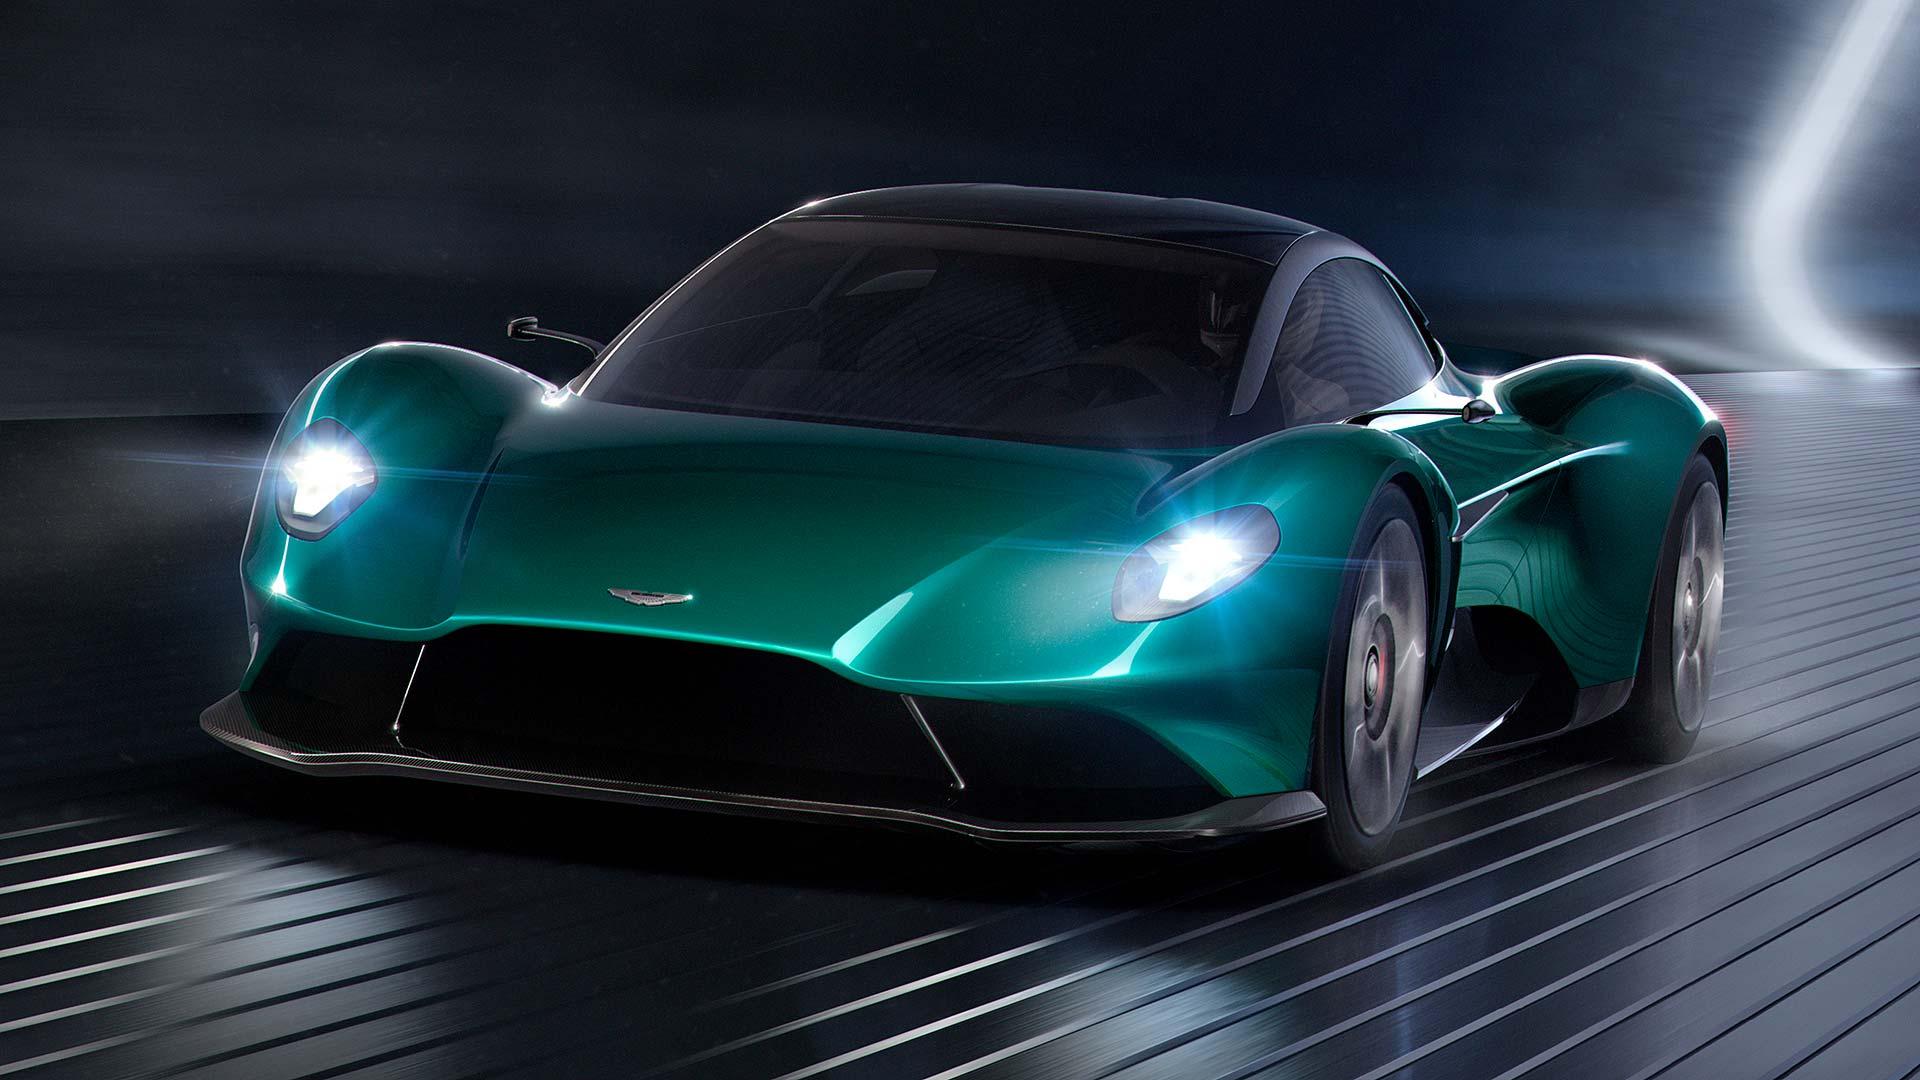 Aston Martin Vanquish Vision Concept